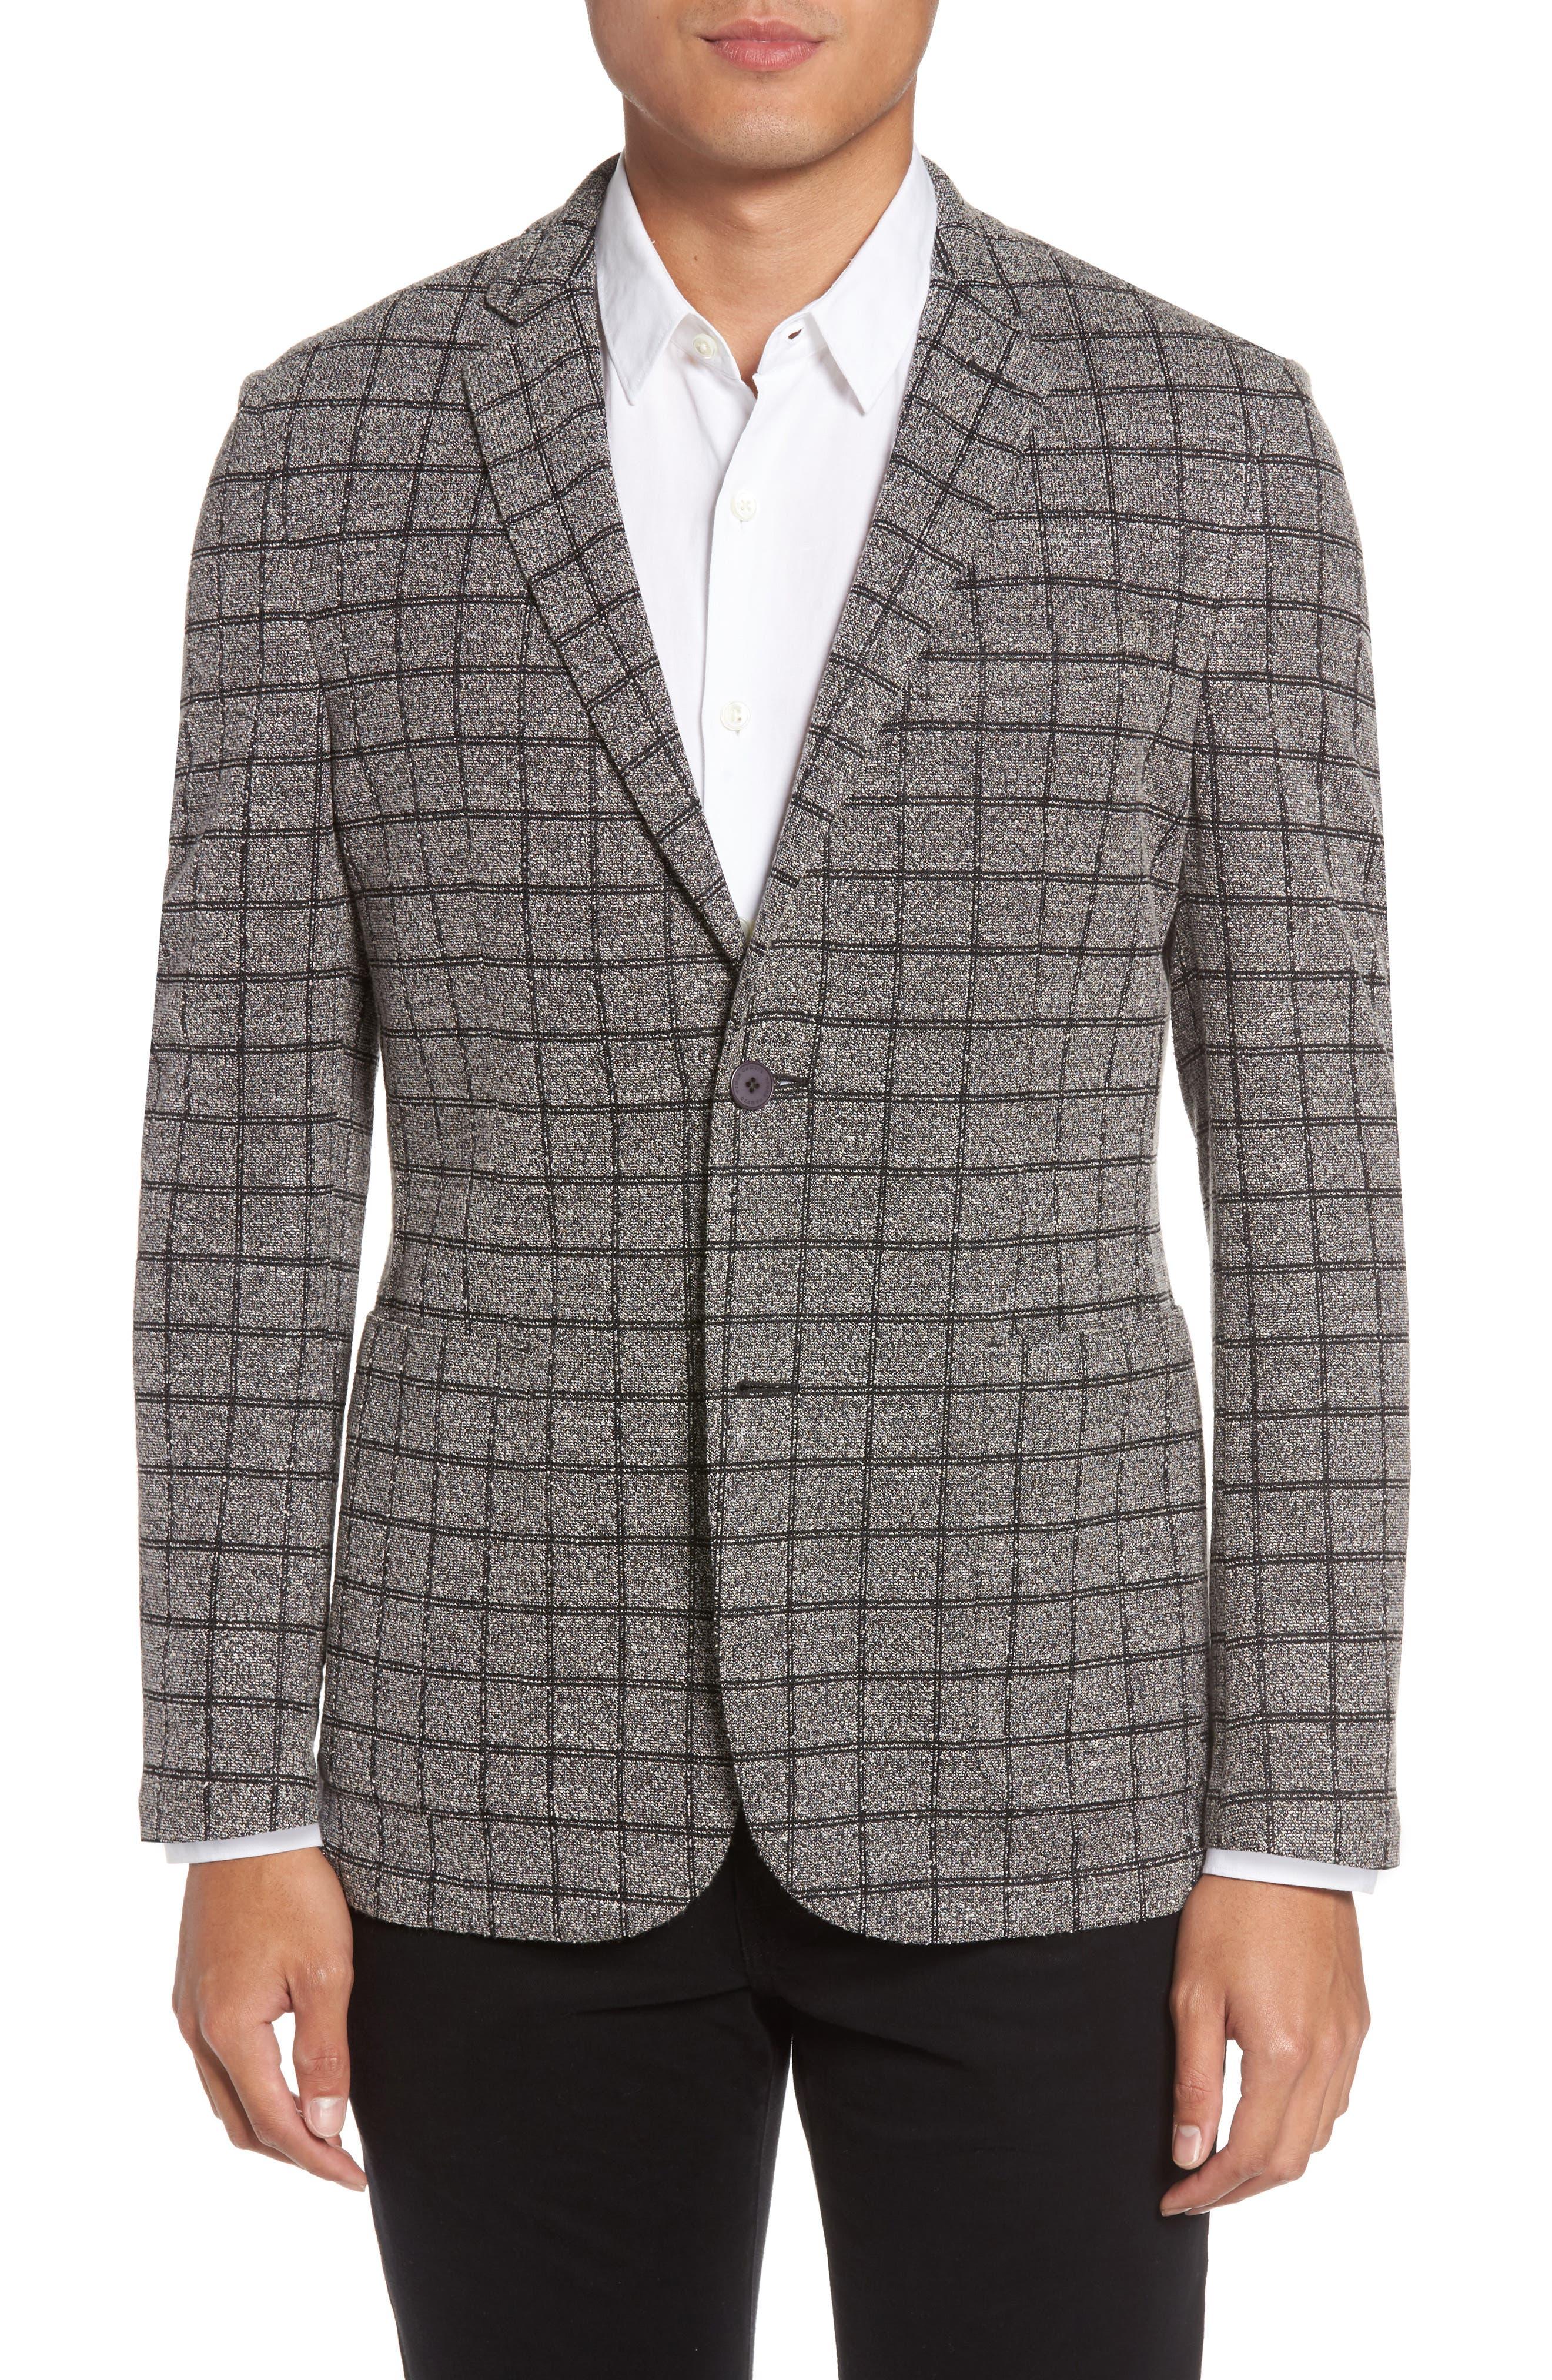 Del Aria Slim Fit Check Knit Jacket,                         Main,                         color, 020